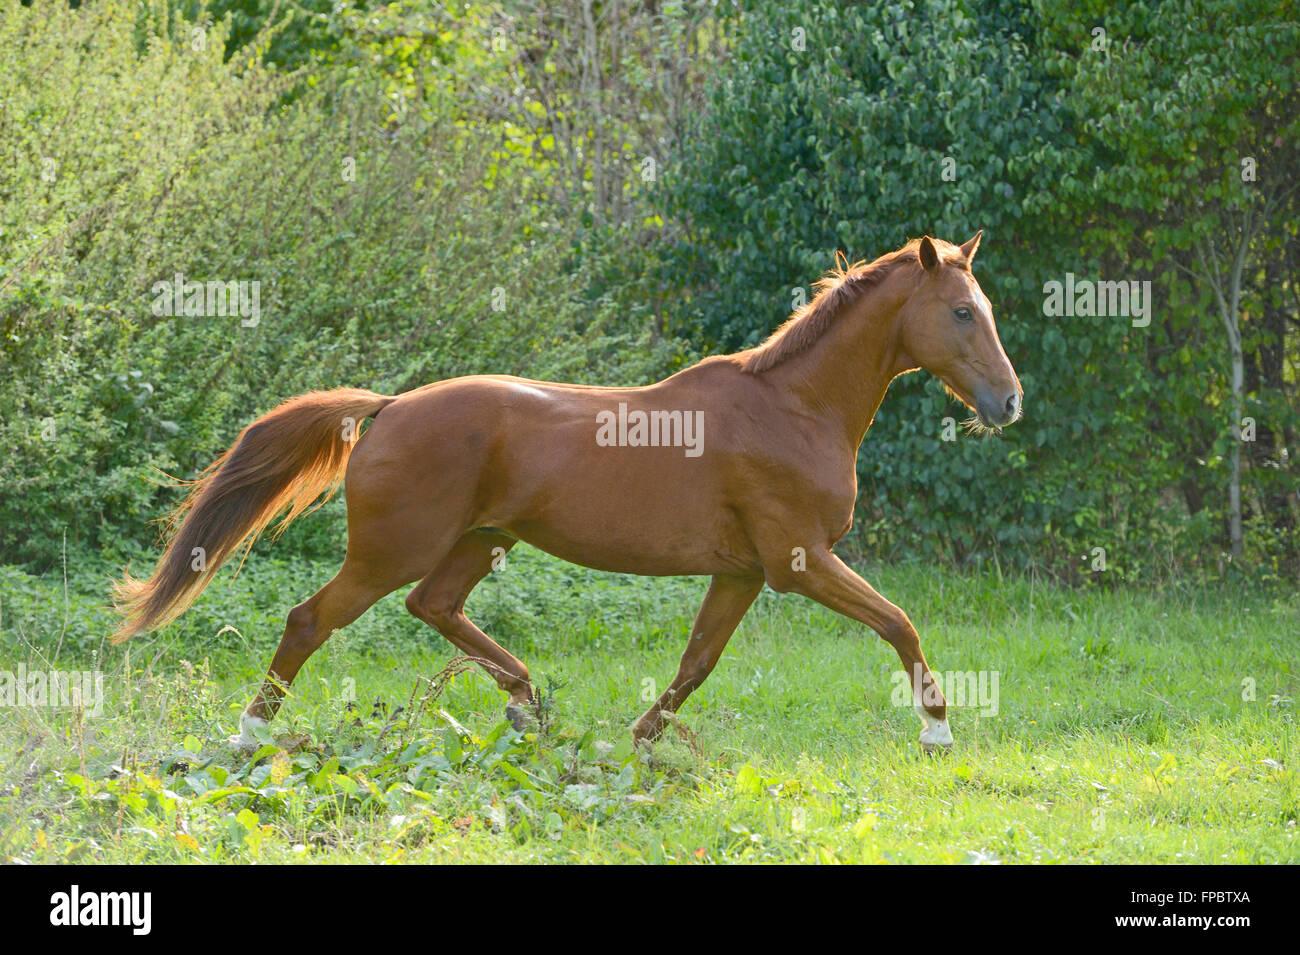 Caballo Trakehnen trote en el campo Imagen De Stock